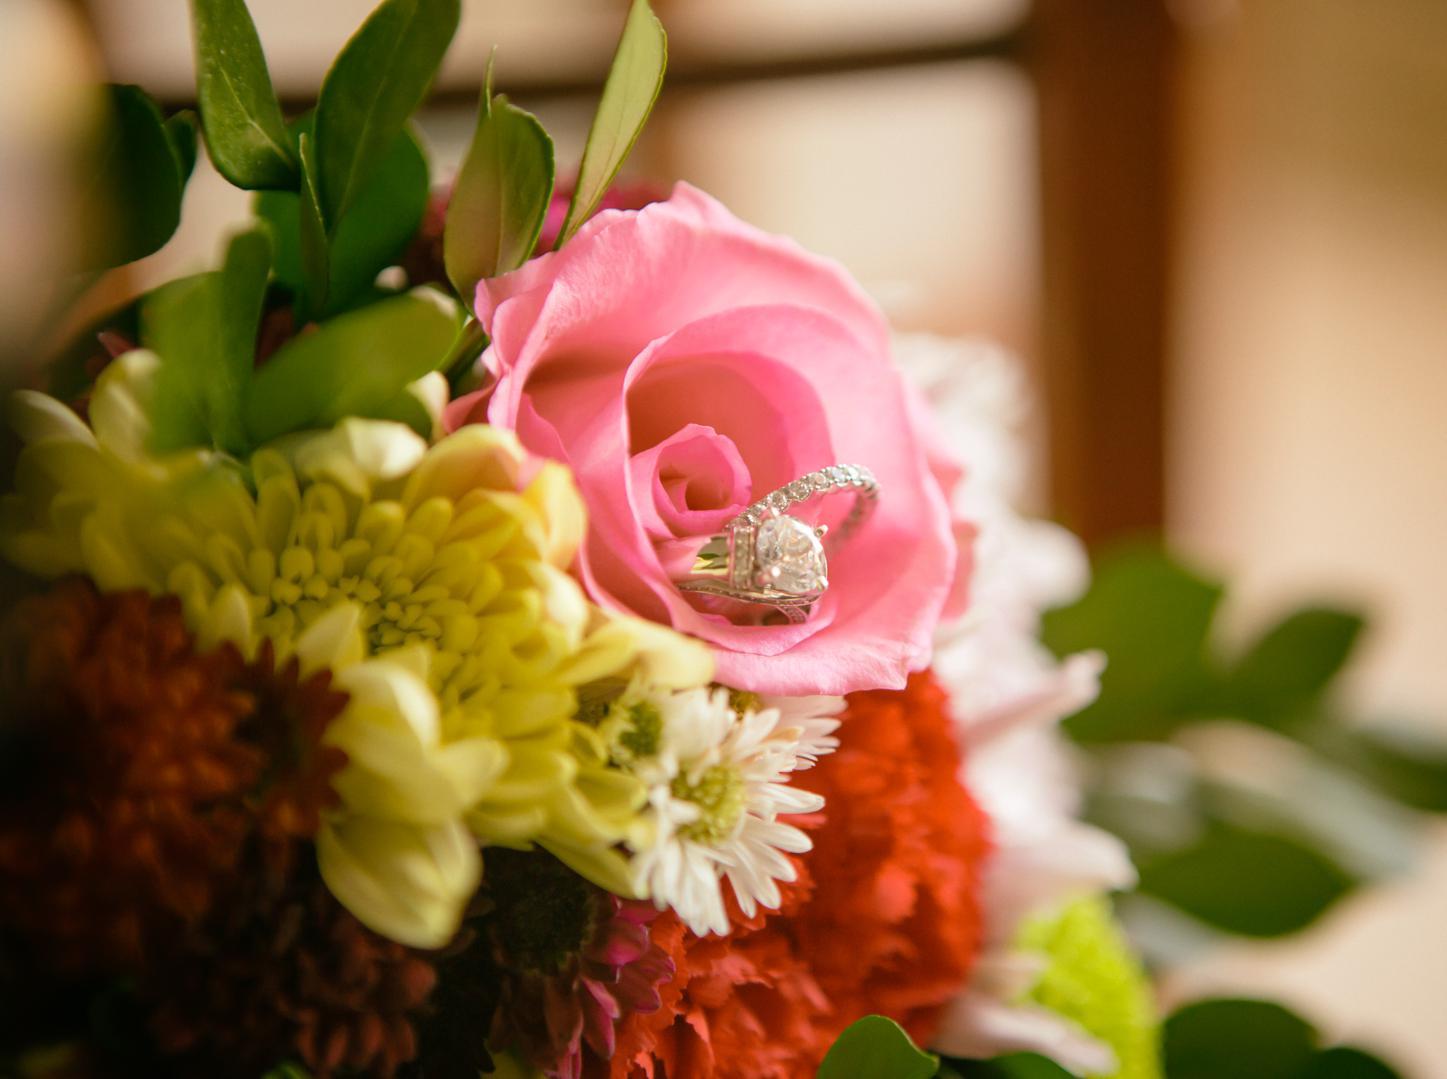 bodas-sin-clasificar-sin-tema-cuba-41991.jpg